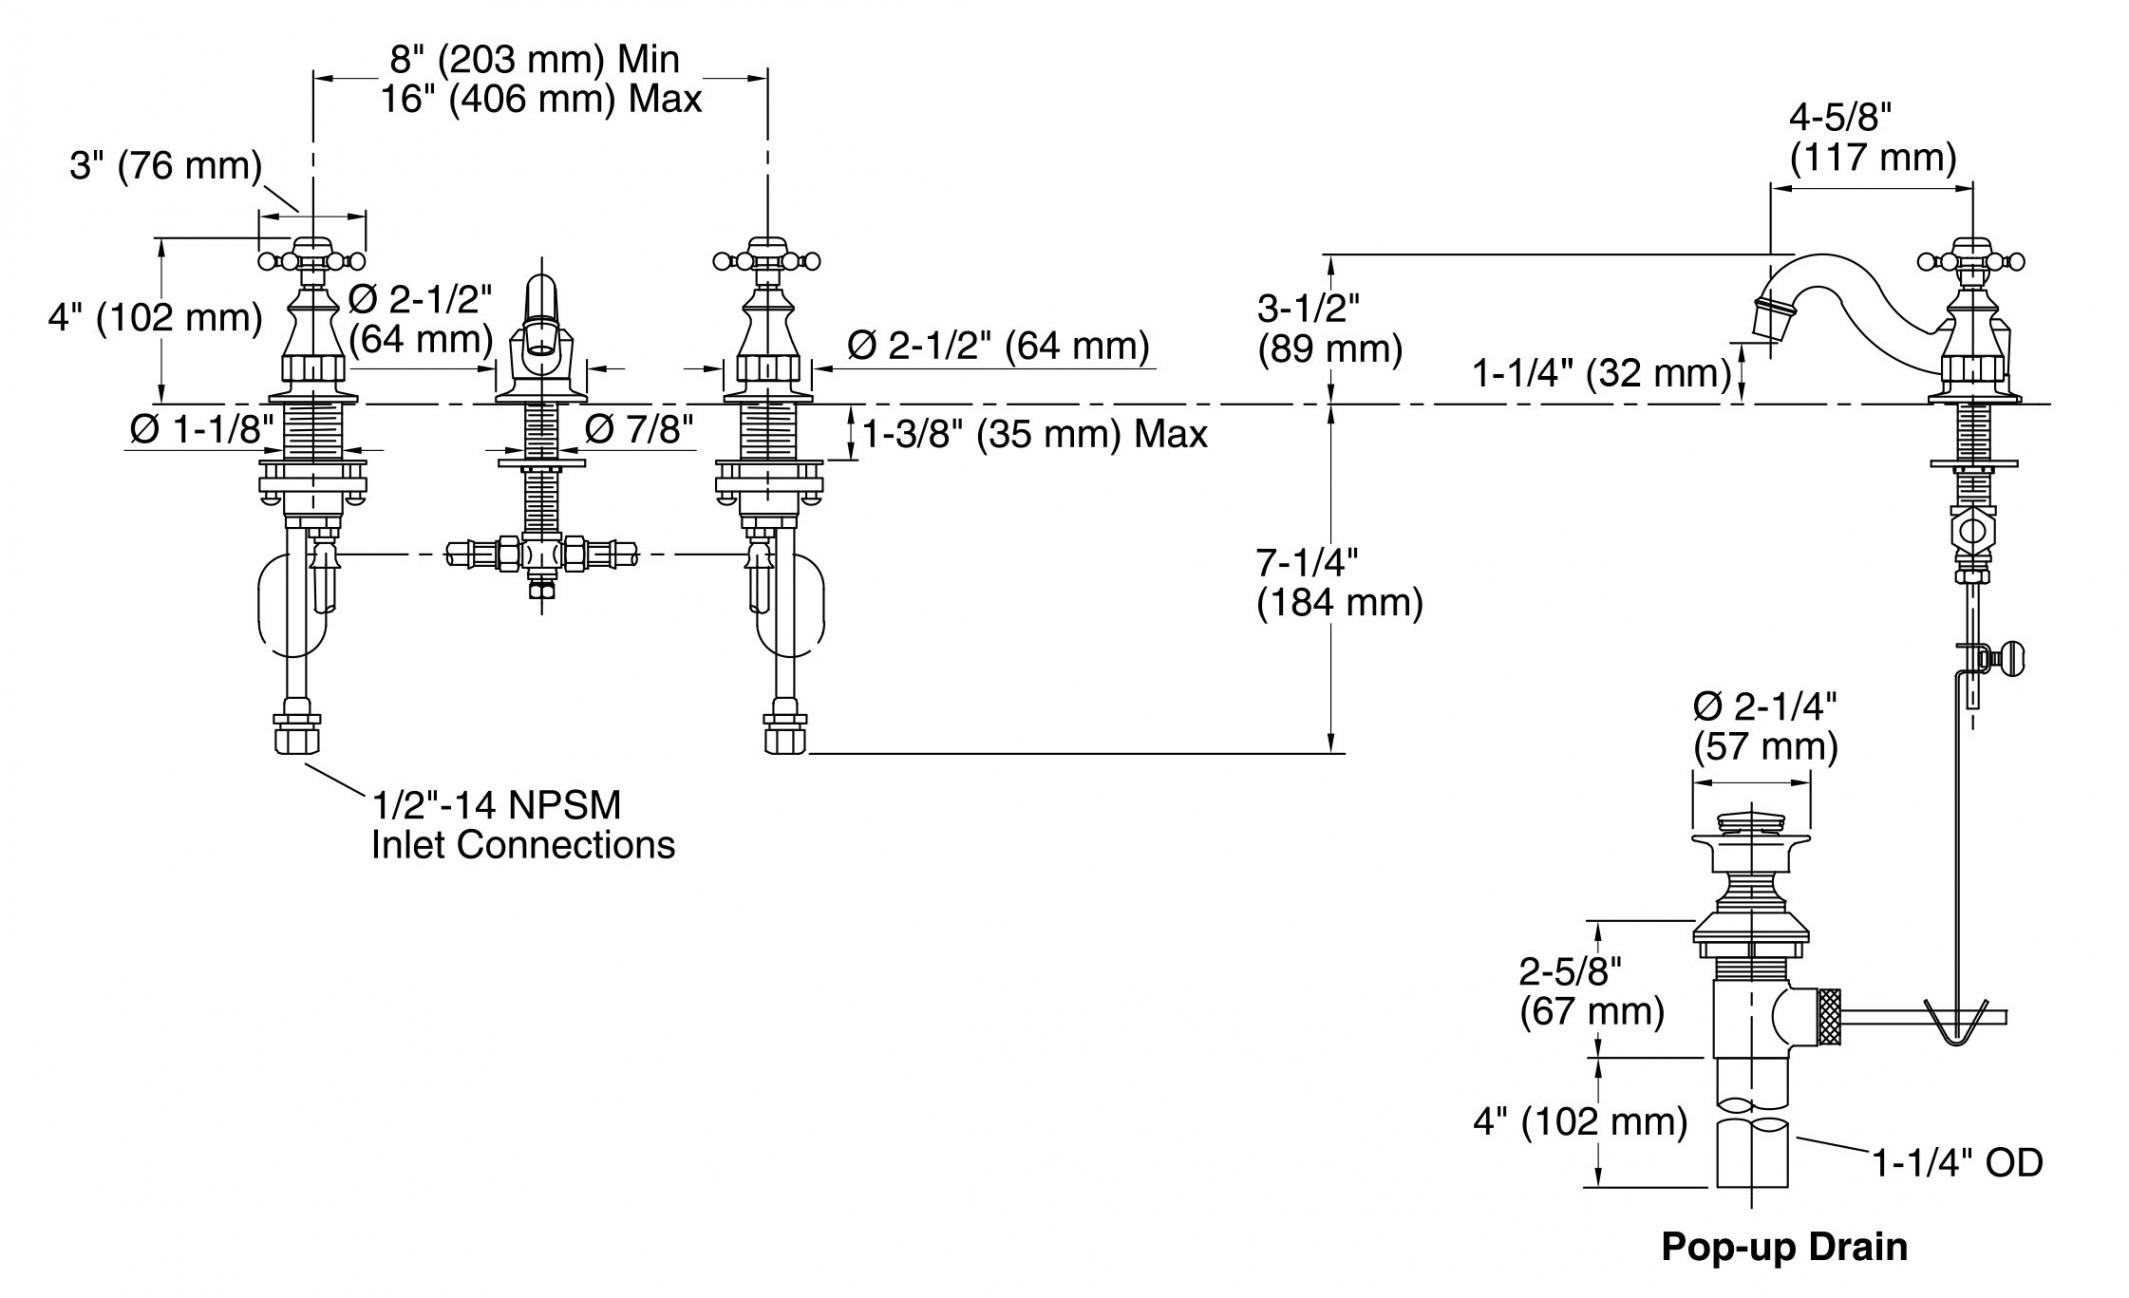 7 3 Engine Parts Diagram Kohler Engine Parts Diagram – Wiring Diagram for  Kohler Engine Valid